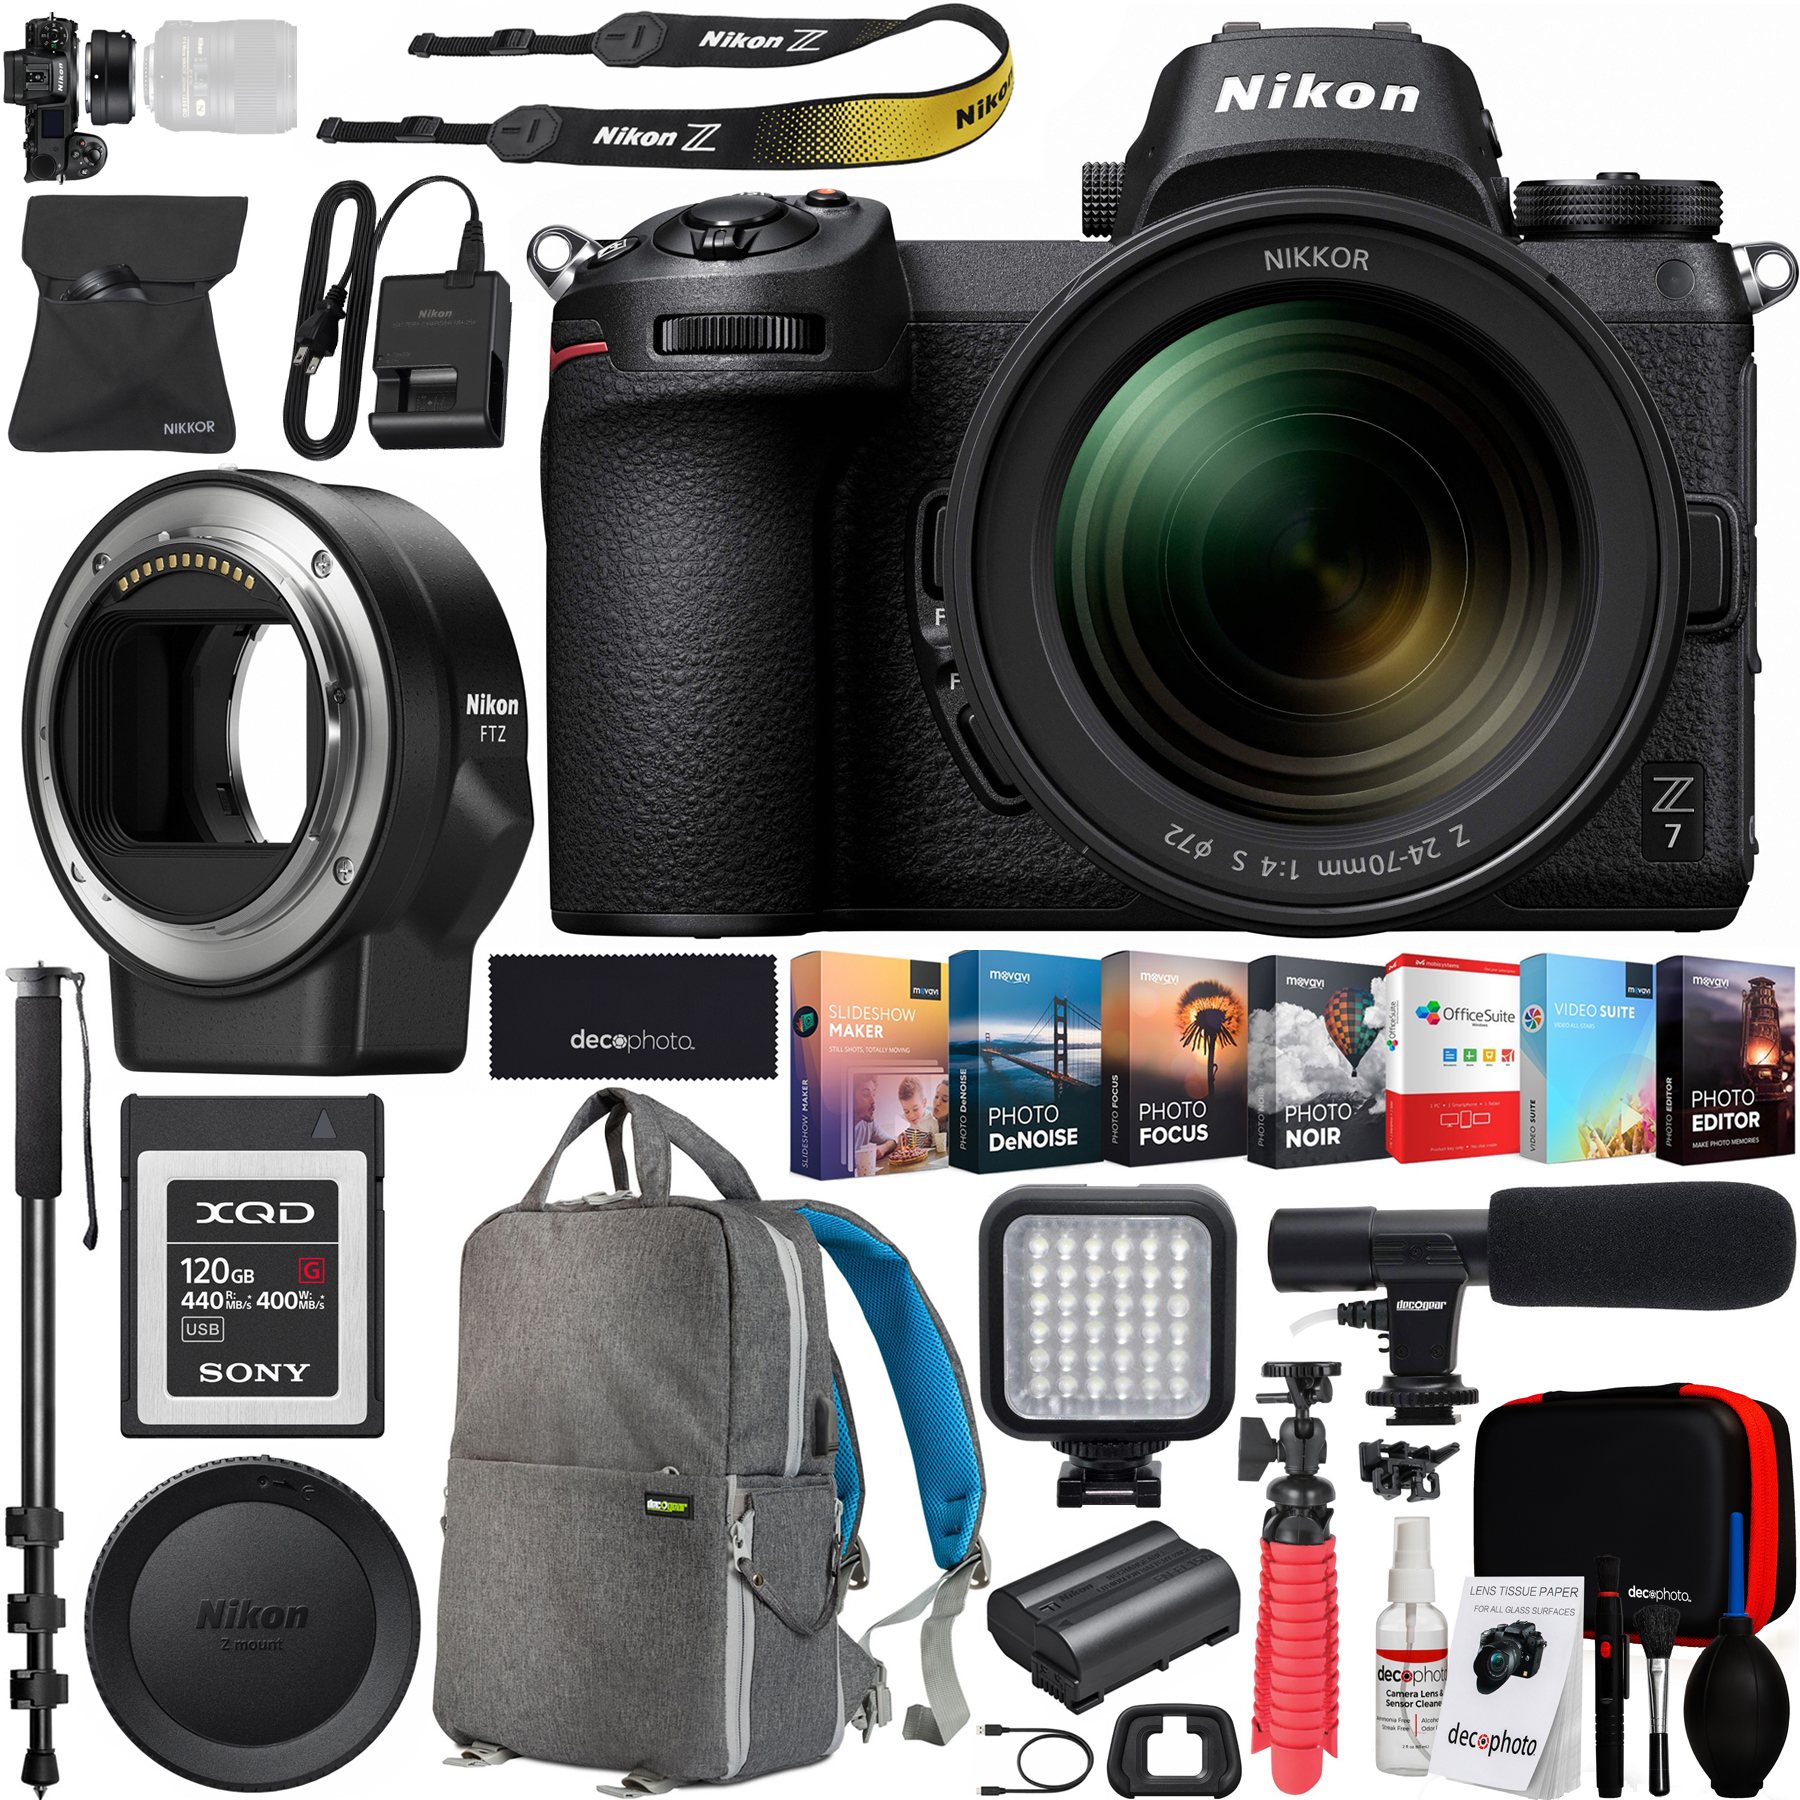 Nikon Z7 Mirrorless Fx Format Full Frame 4k Ultra Hd